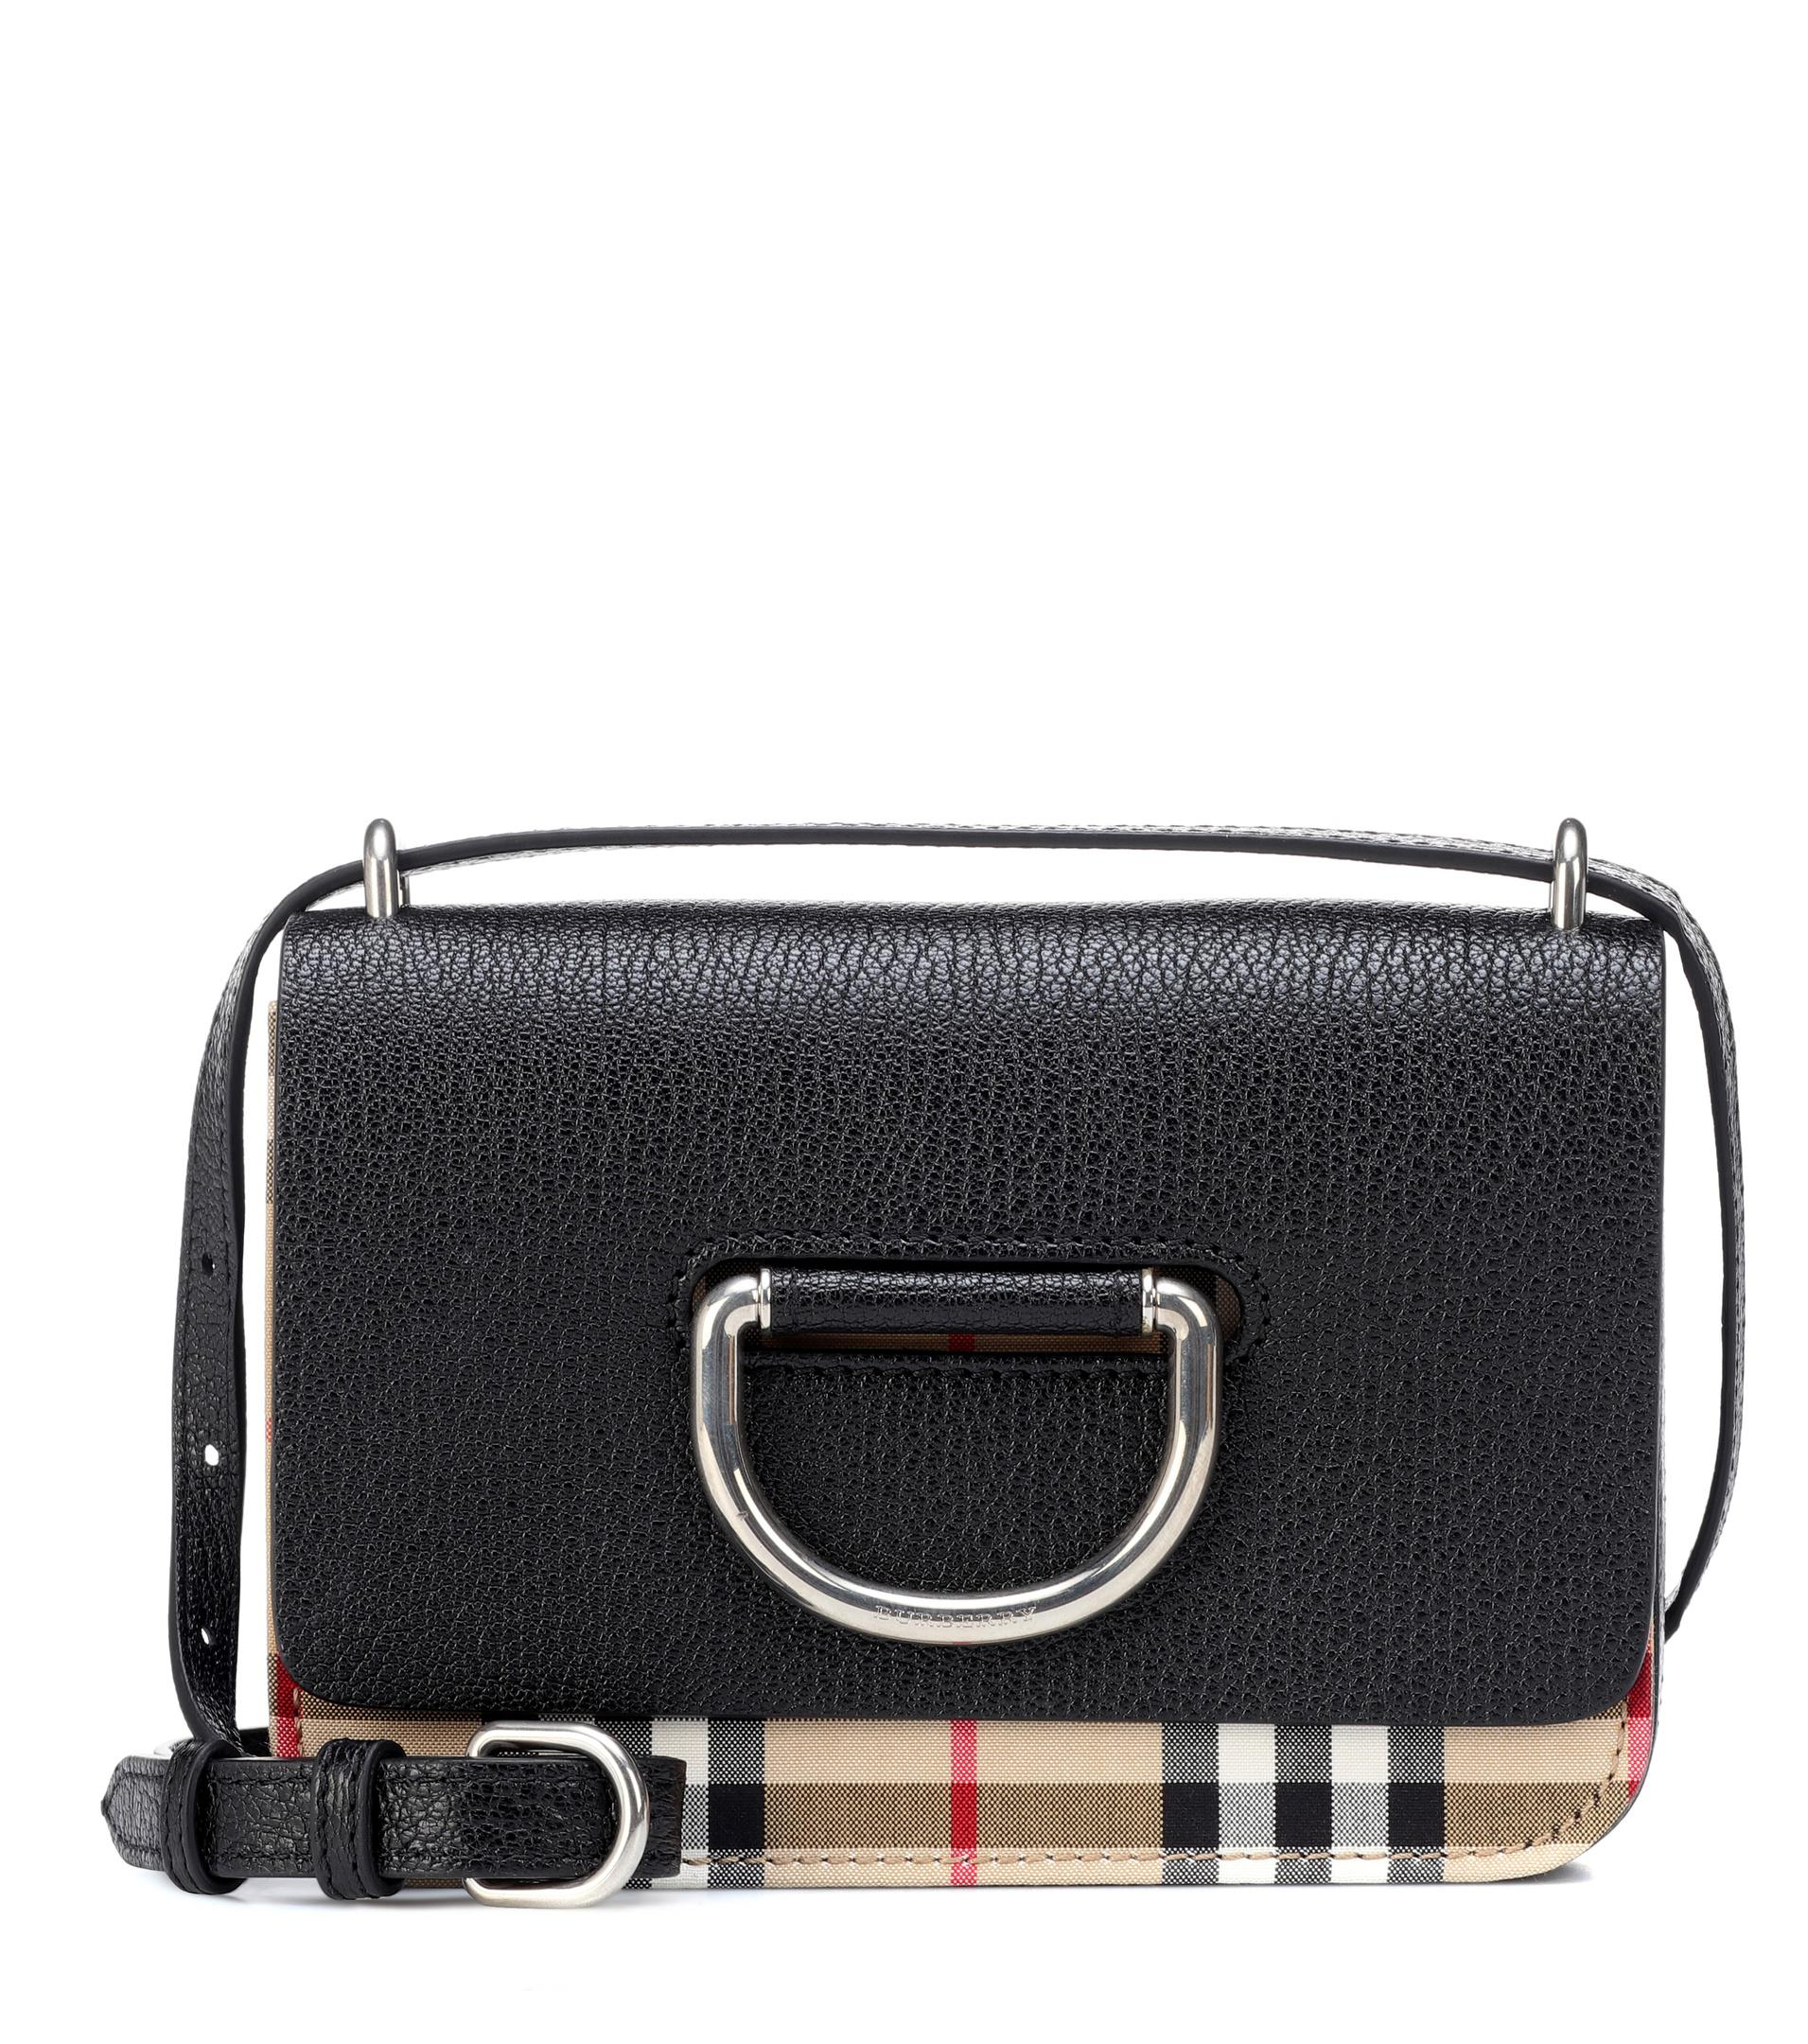 fa56c928a3cc Burberry Mini Vintage Check Crossbody Bag in Black - Lyst